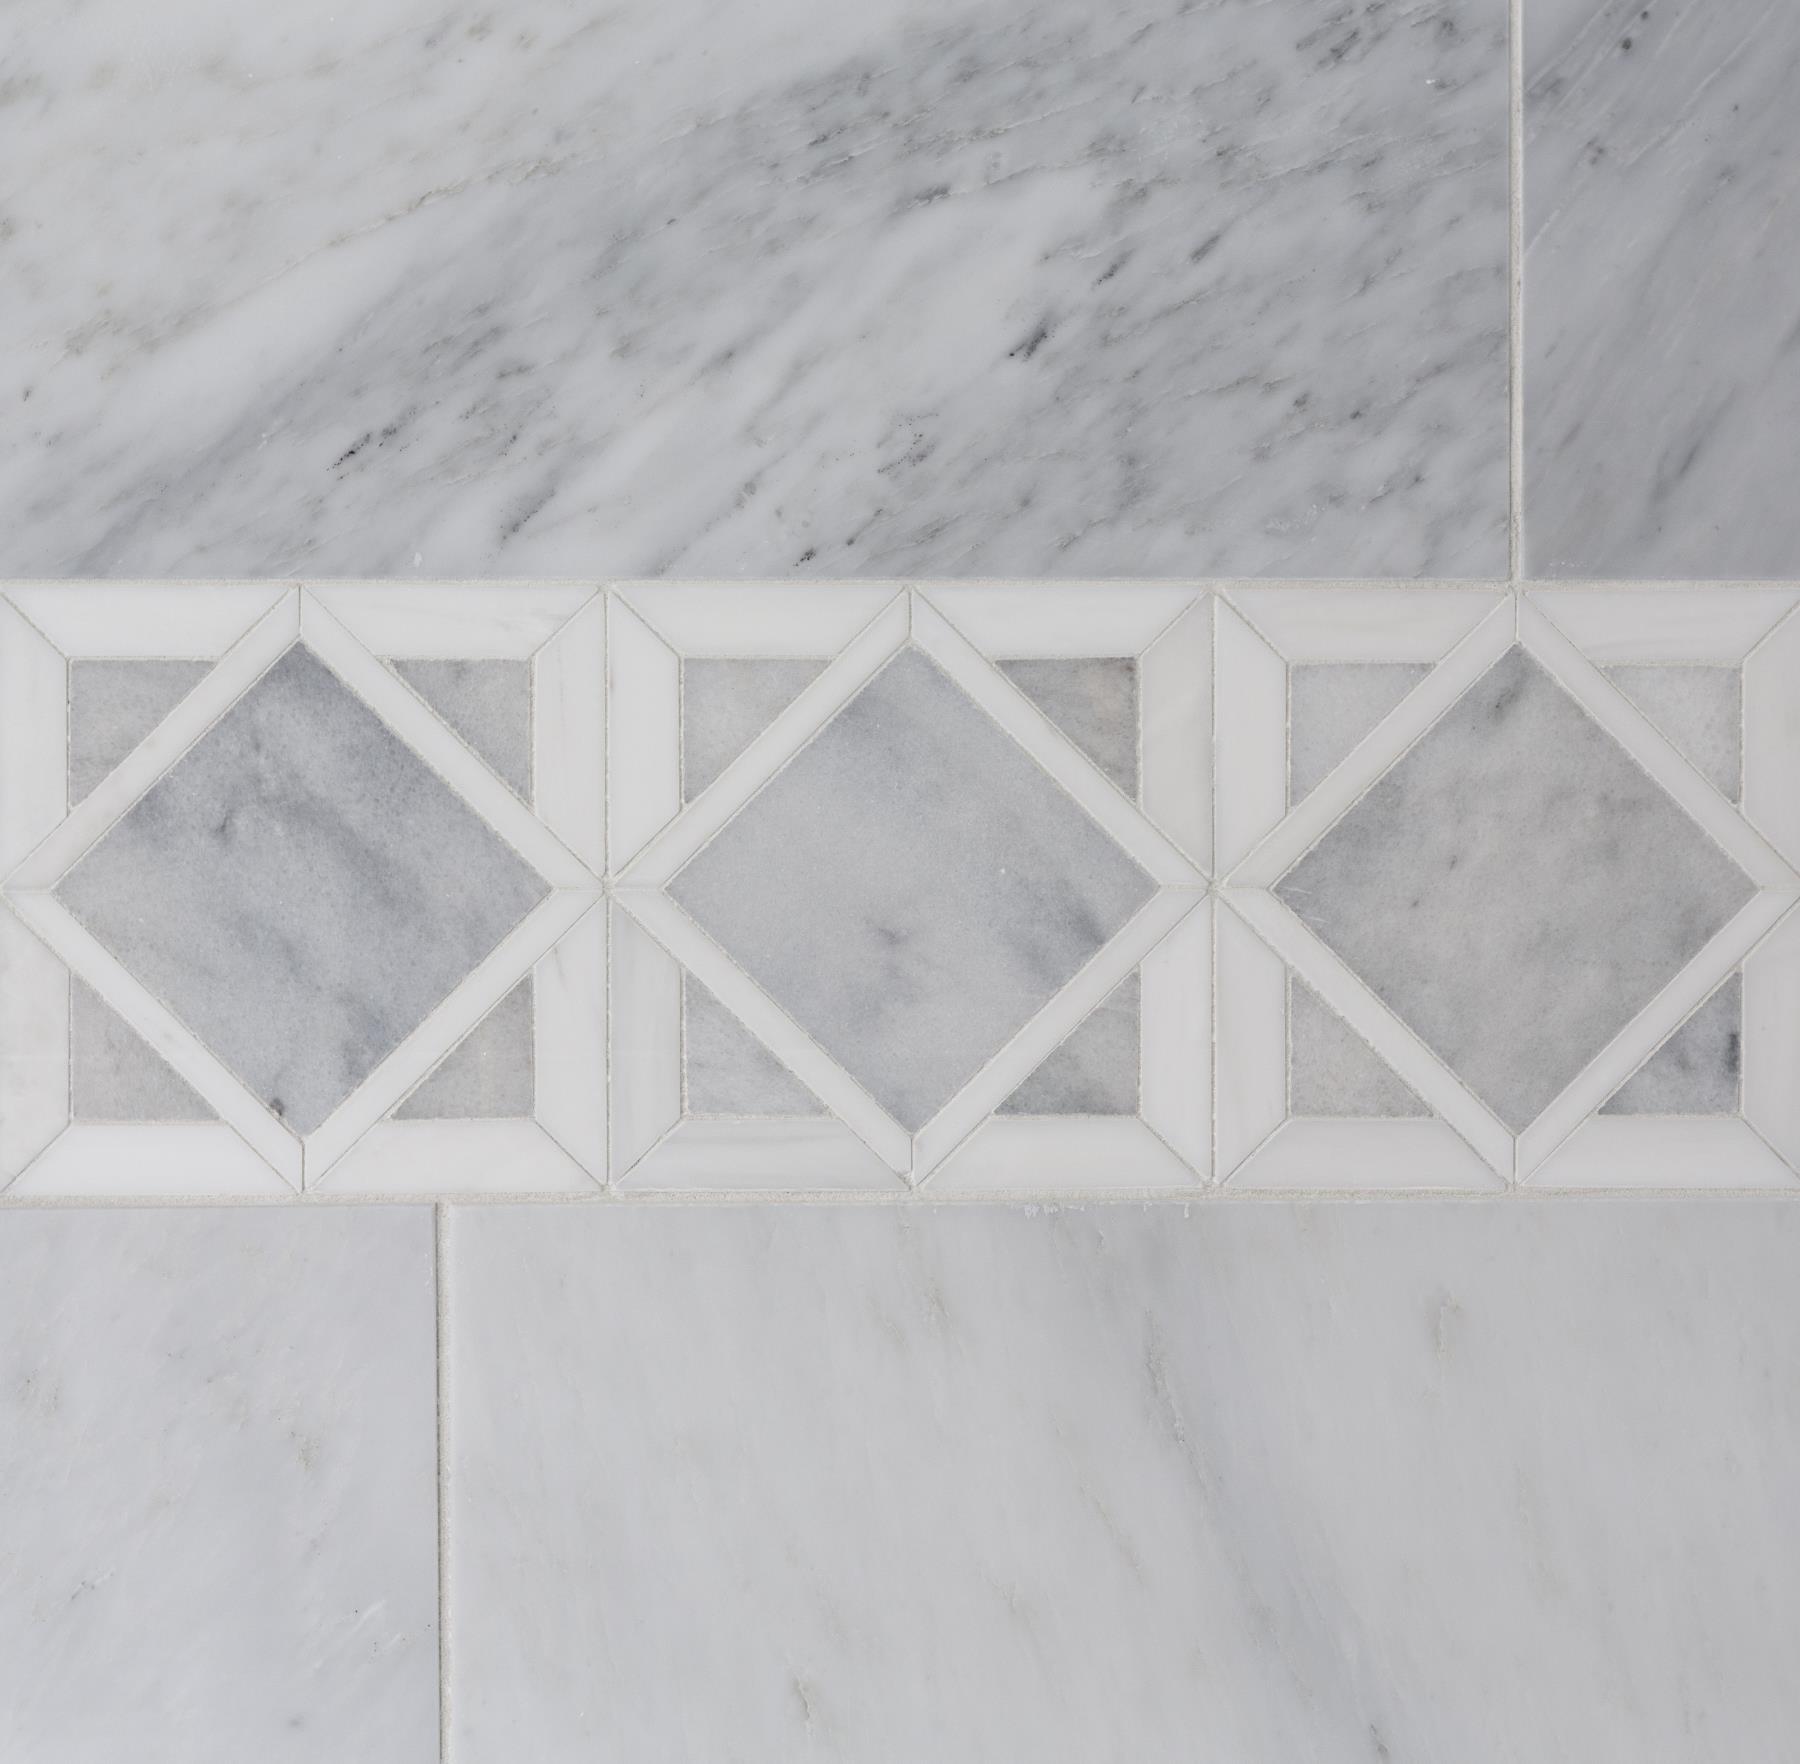 Interior-desiInterior-design-arkansas-bathroom-refresh-gn-arkansas-midcentuKrista-Lewis-001